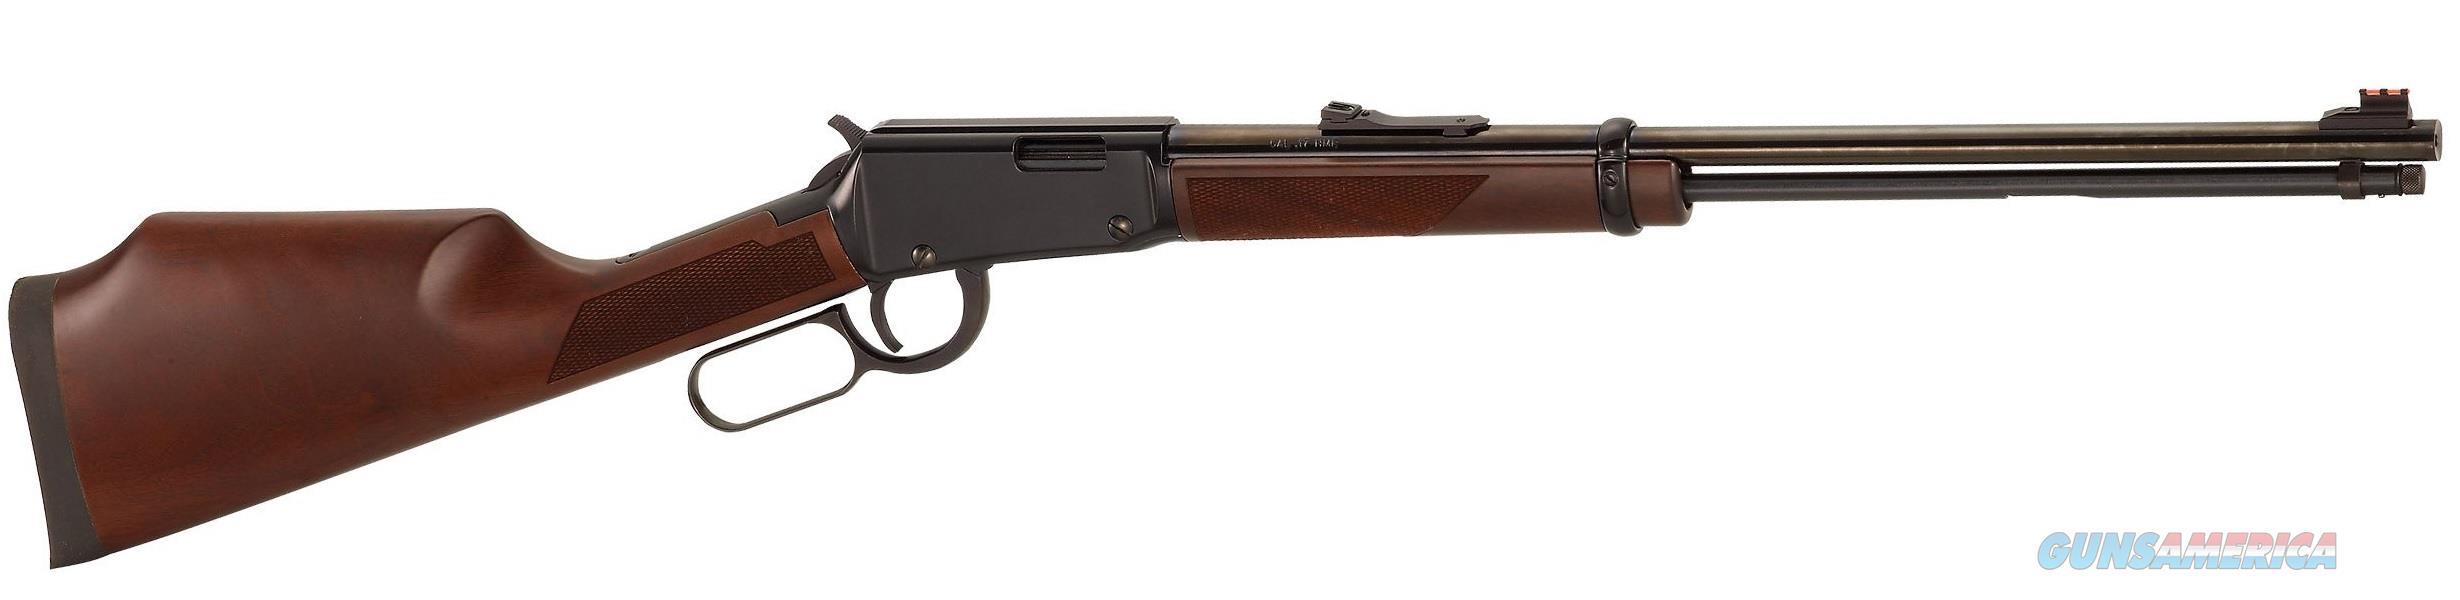 "Henry Varmint Express .17 HMR 19.25"" 11 Rds H001V   Guns > Rifles > Henry Rifle Company"